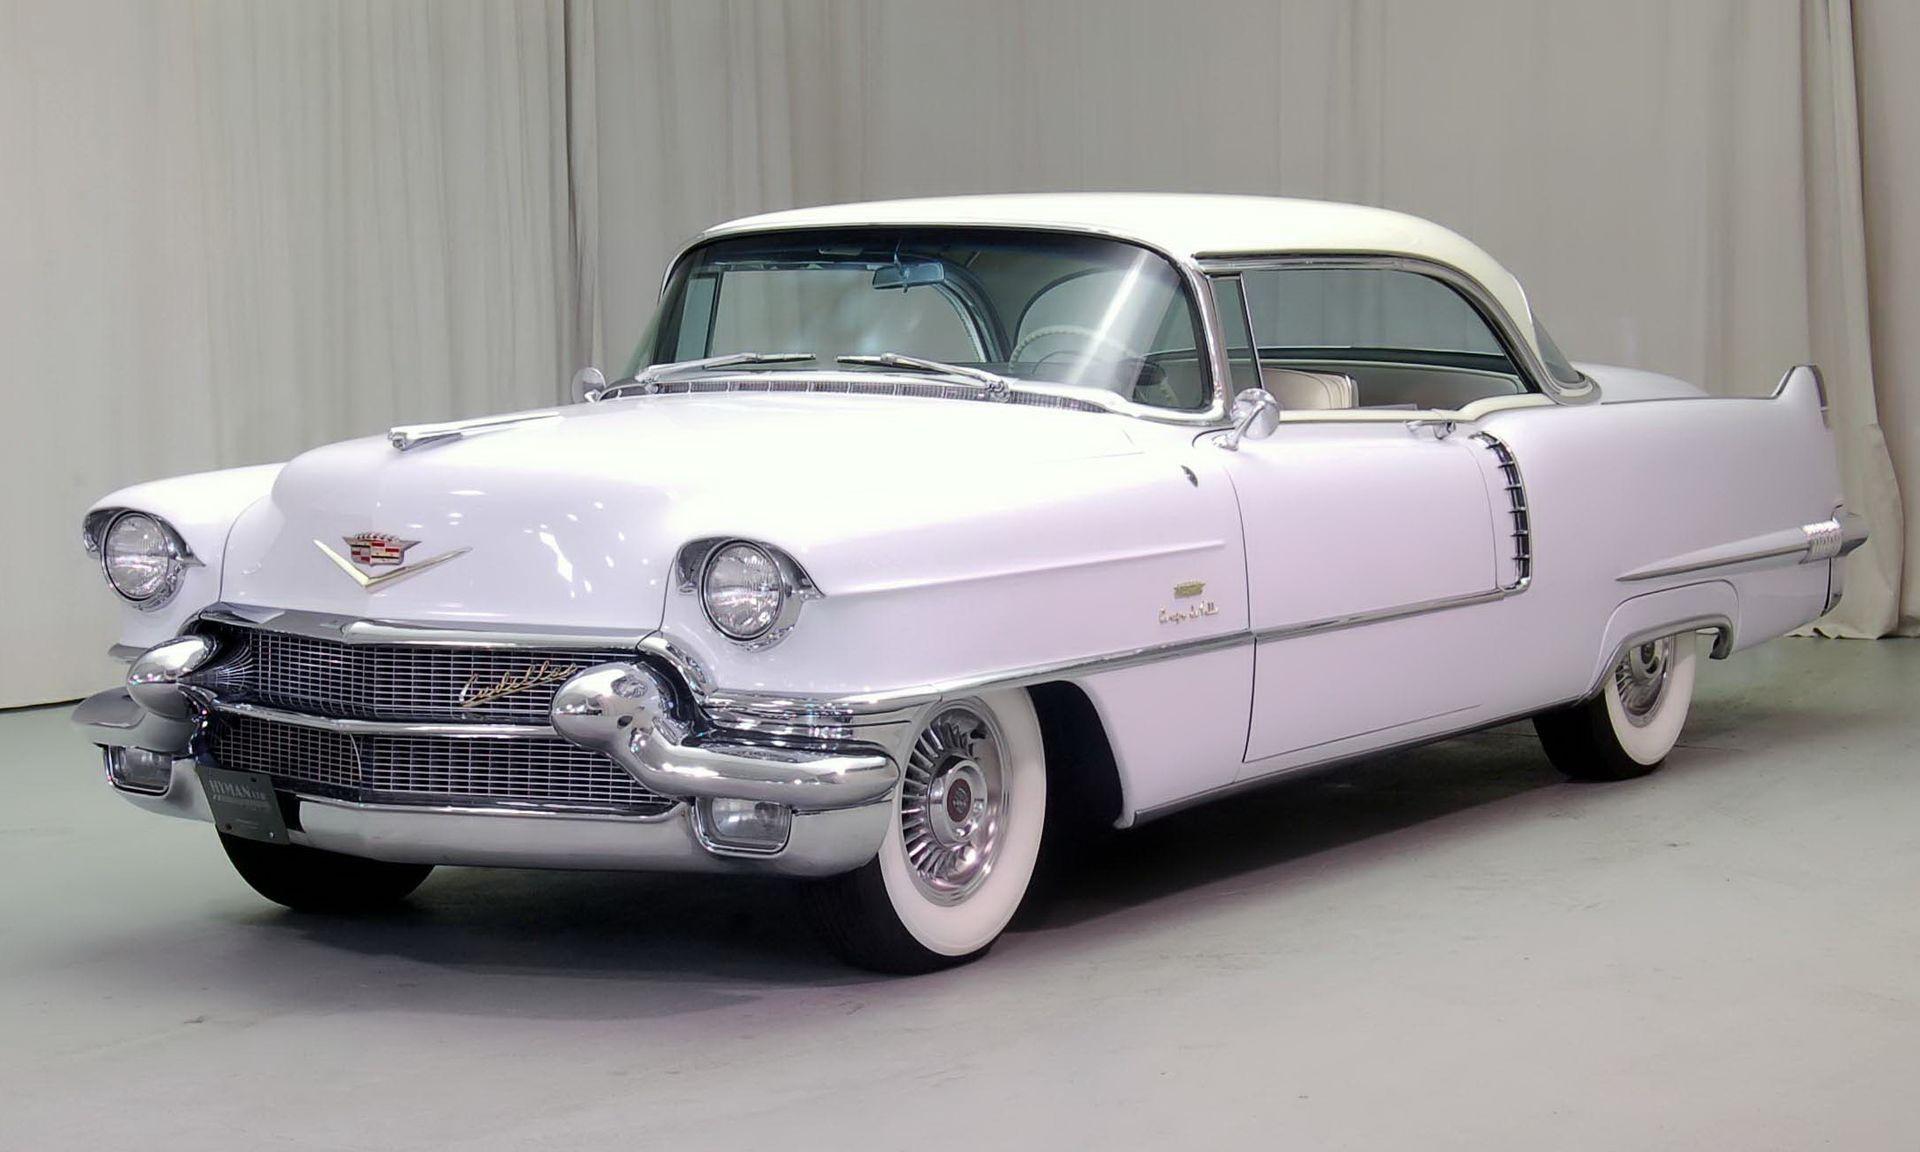 1956 Cadillac Coupe De Ville white cropped